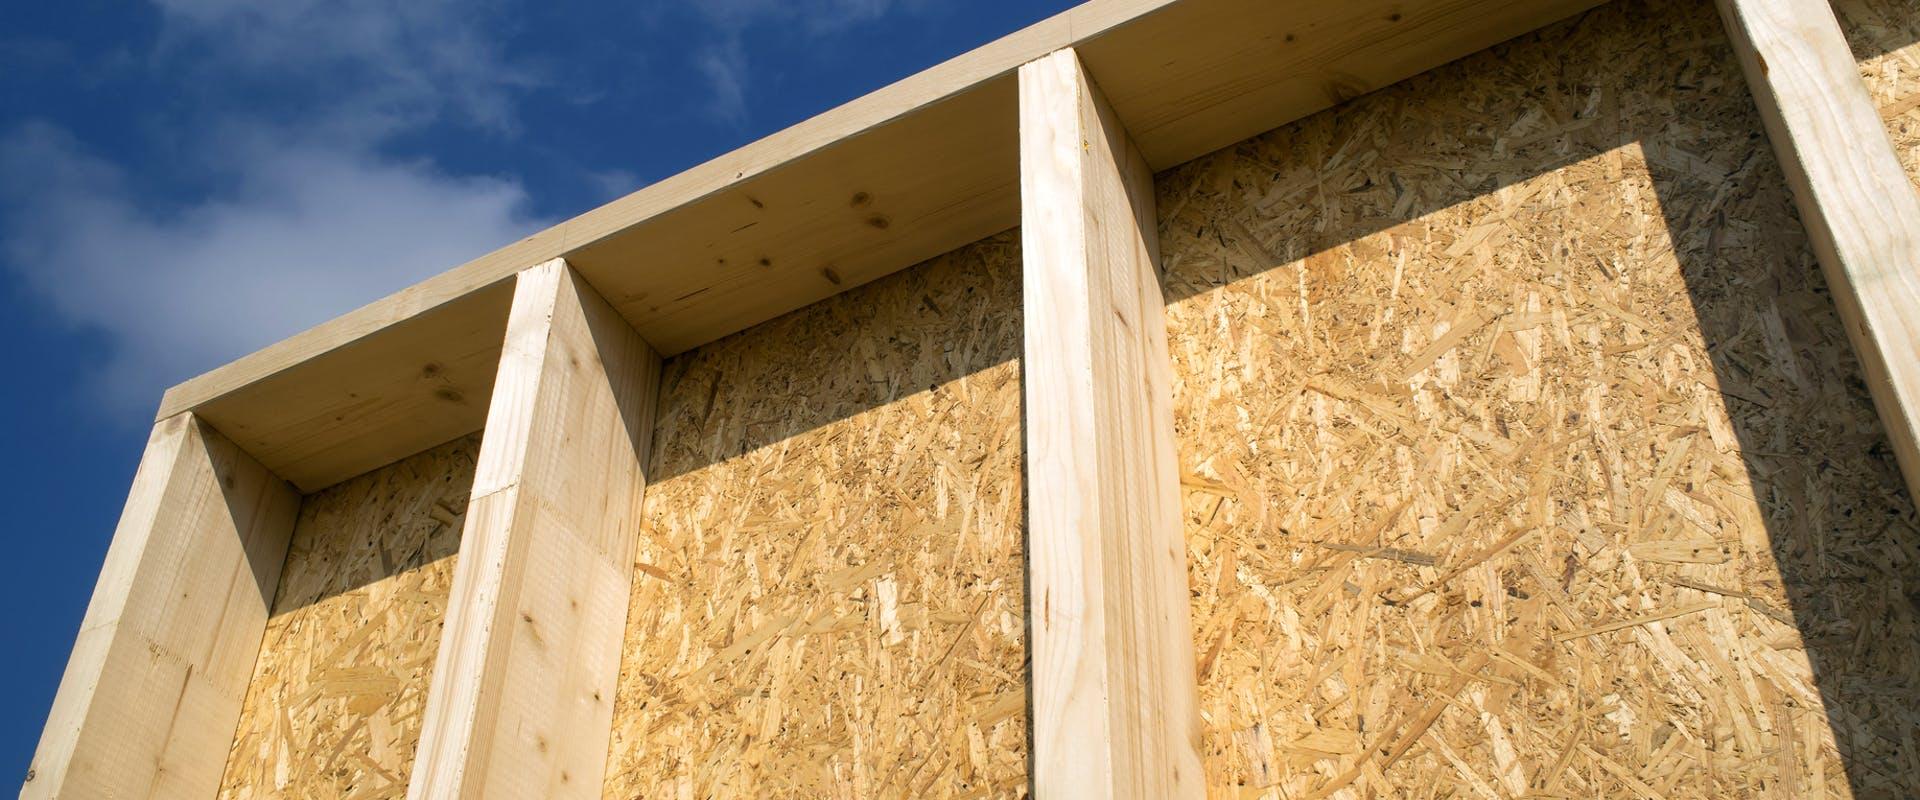 Holzrahmenbau: Konstruktion und Dämmung - Fertighaus.de Ratgeber